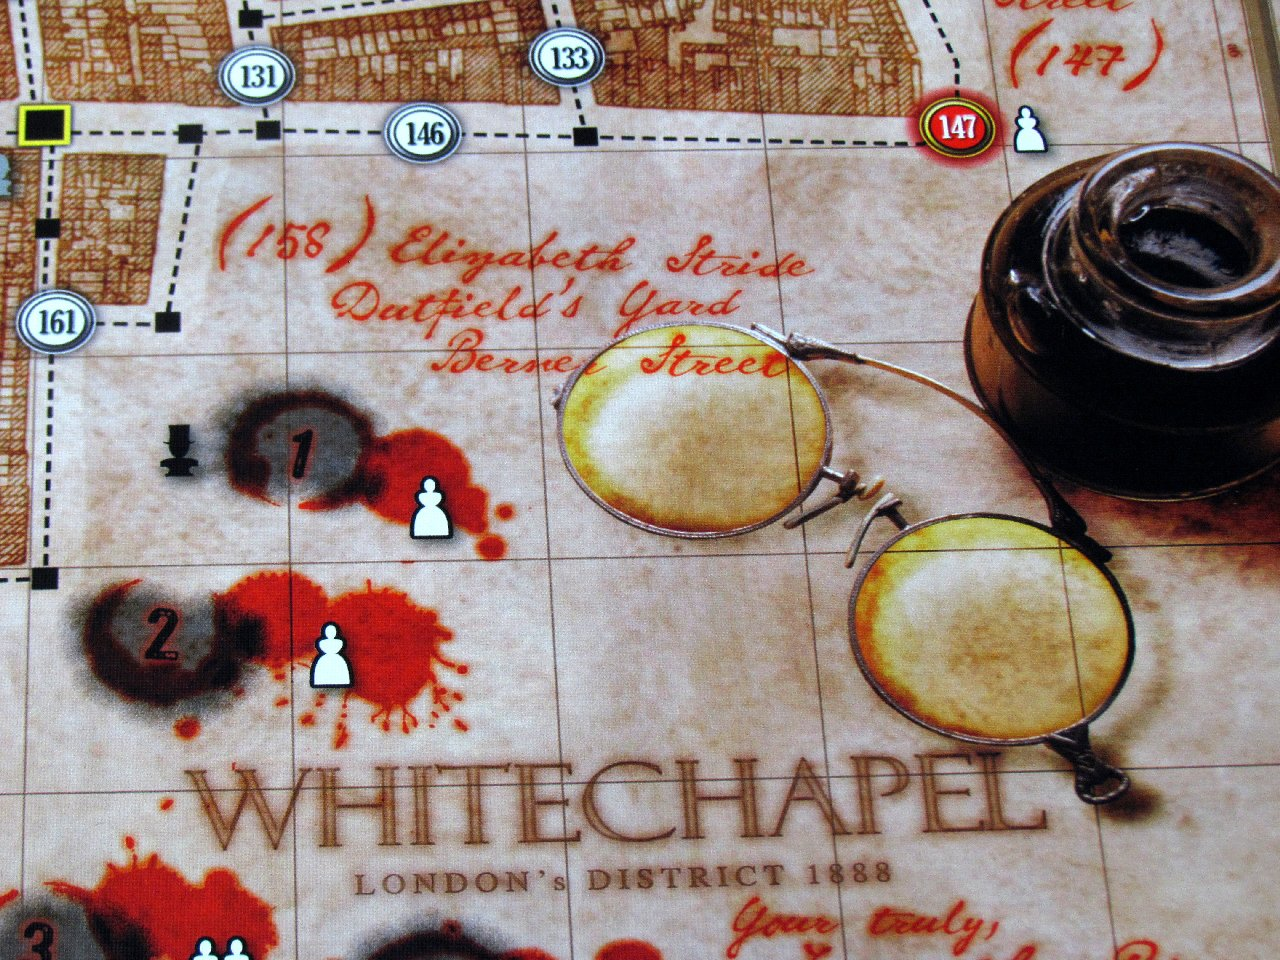 letters-from-whitechapel-13